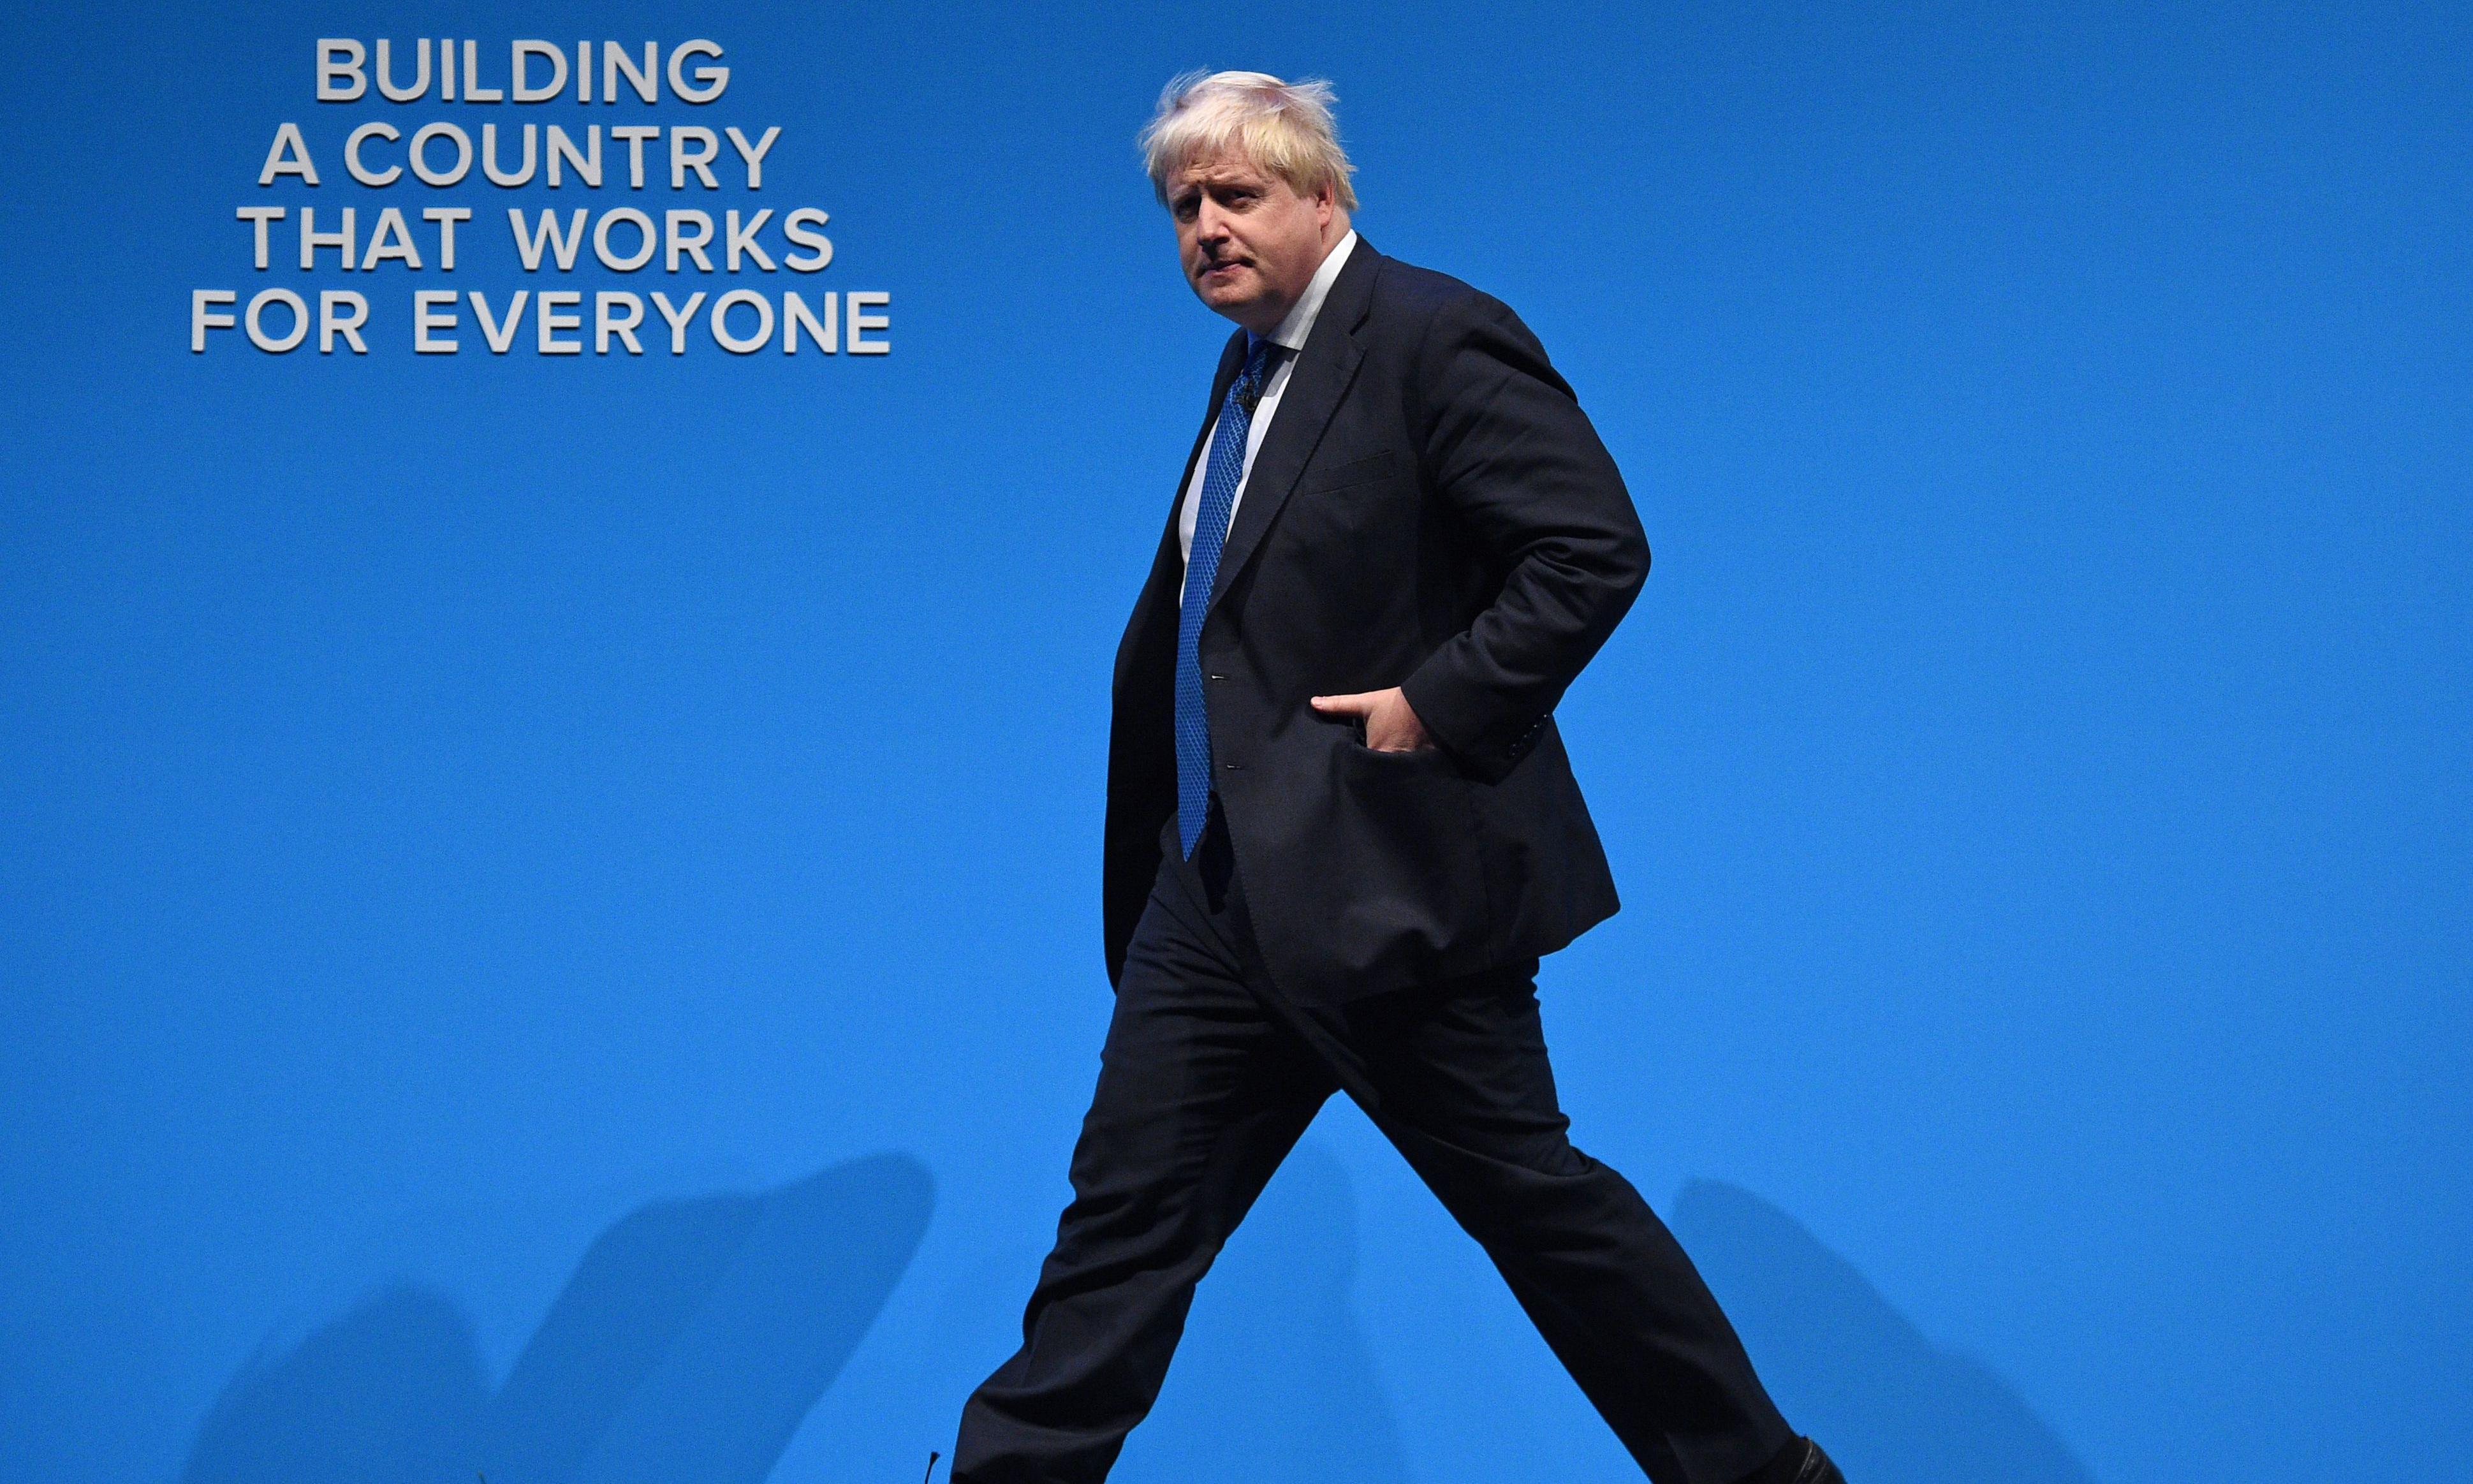 Under Boris Johnson, Islamophobia will reach a sinister new level